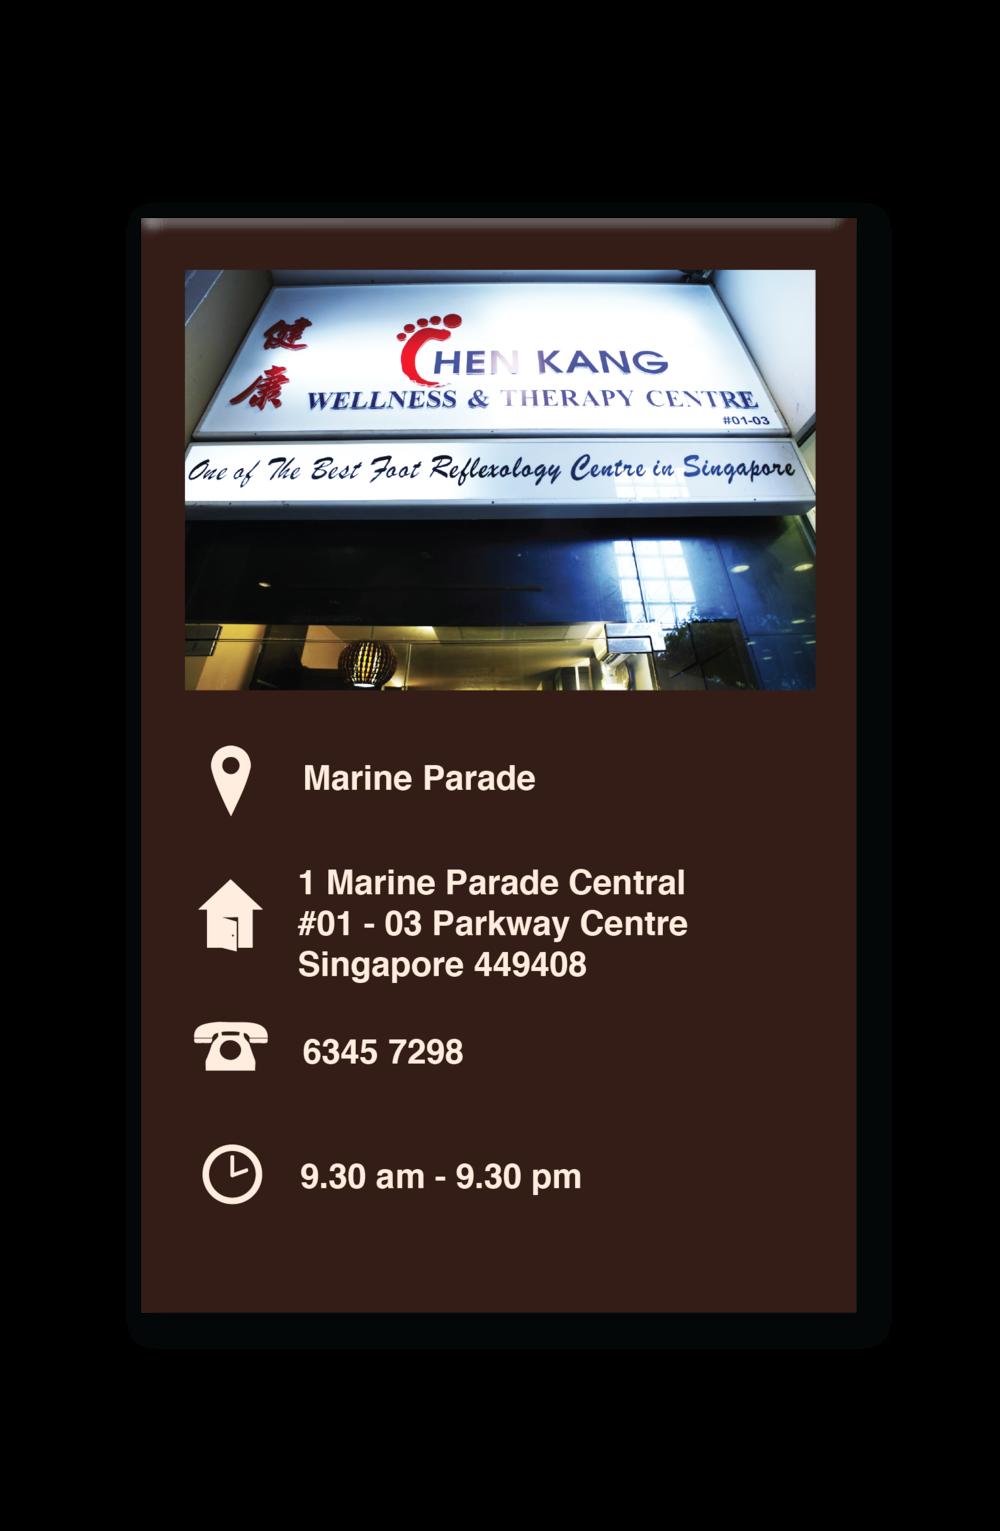 marineparade.jpg